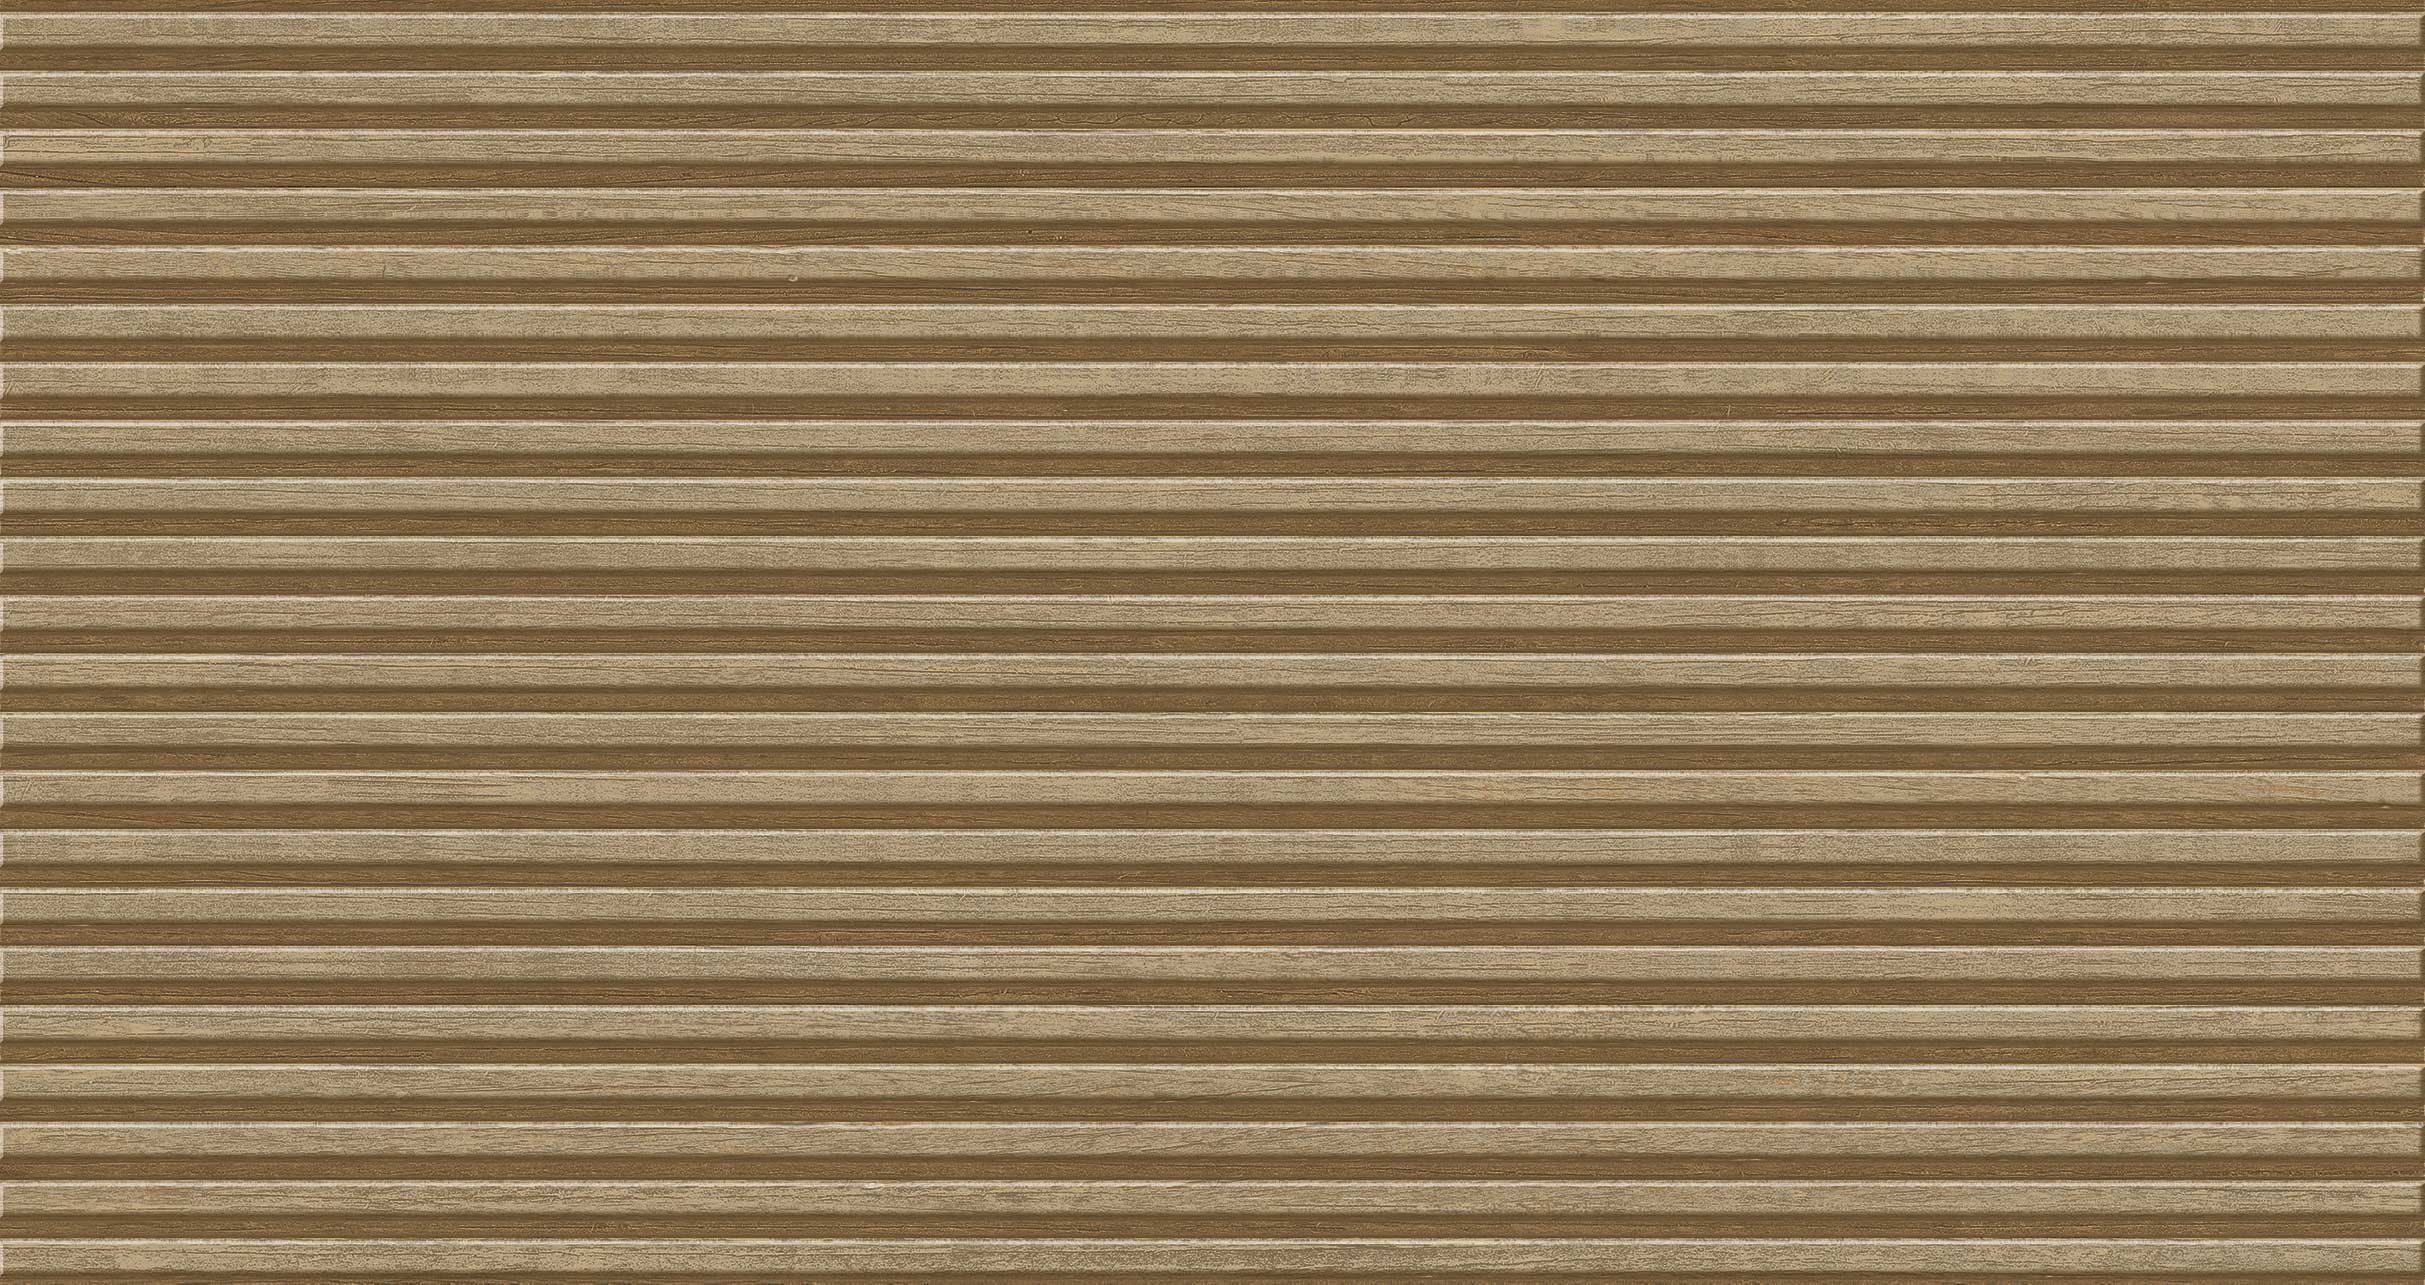 rig-legno-biancogres